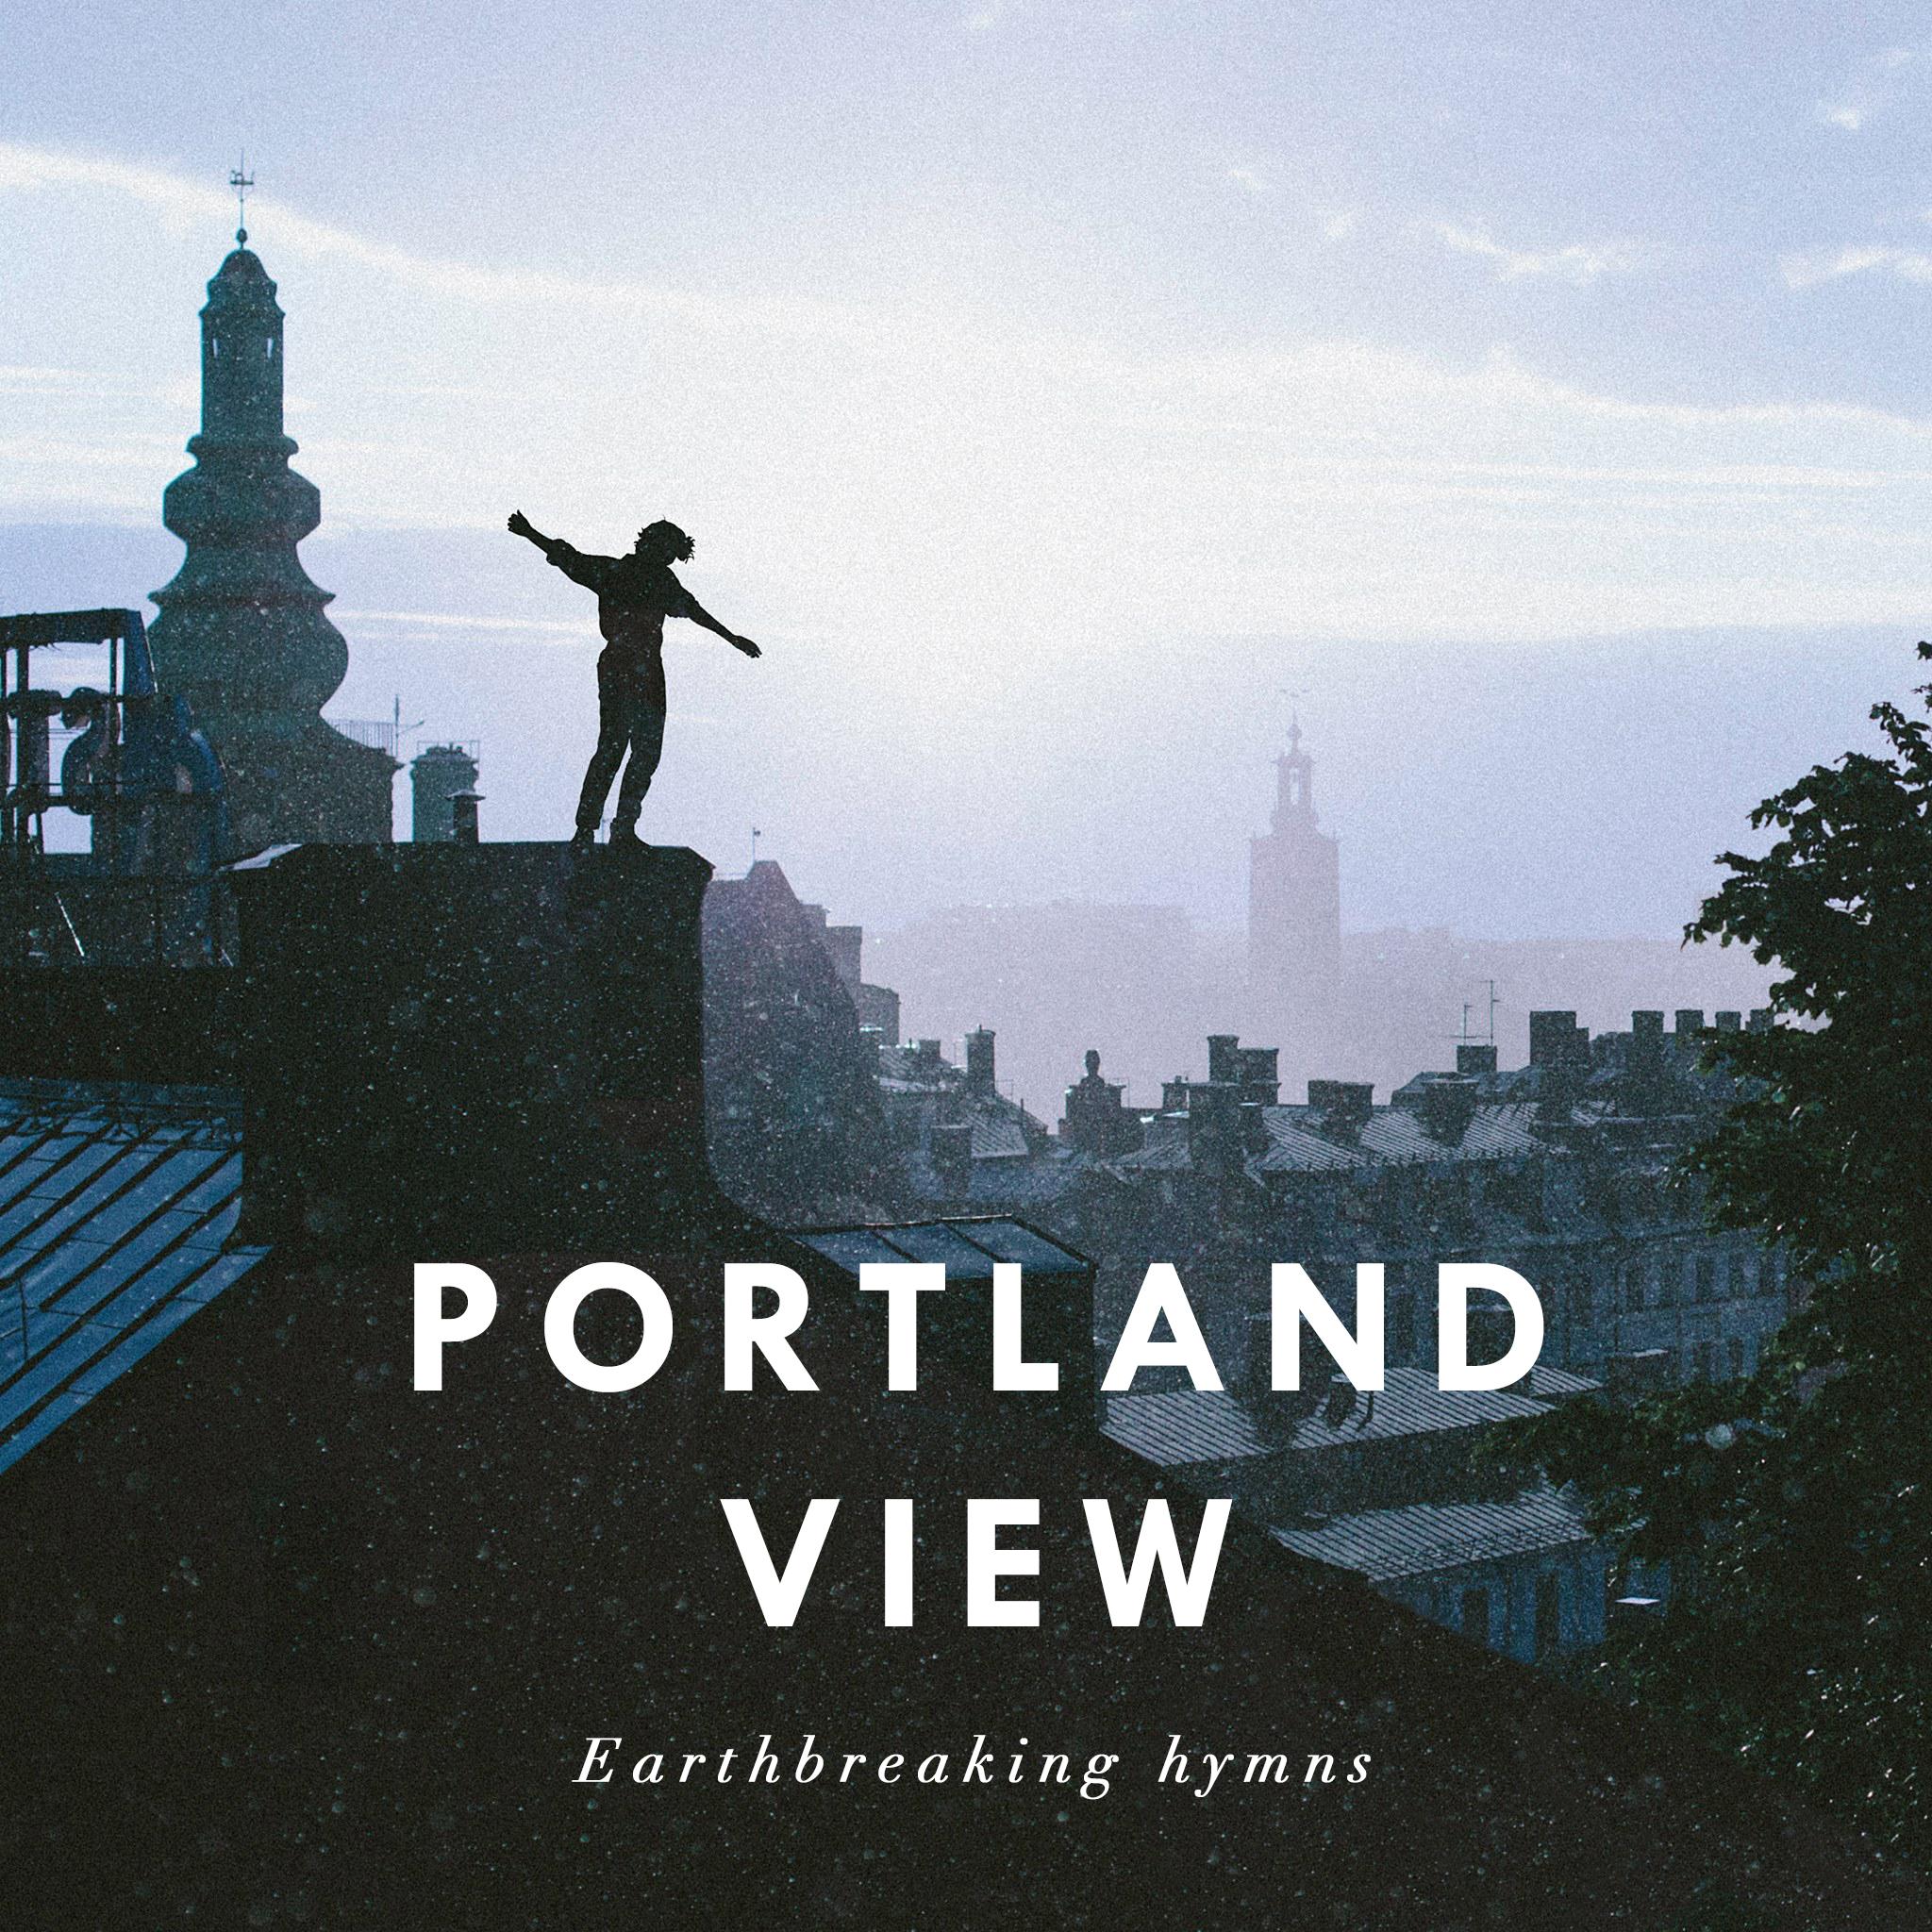 portlandview3